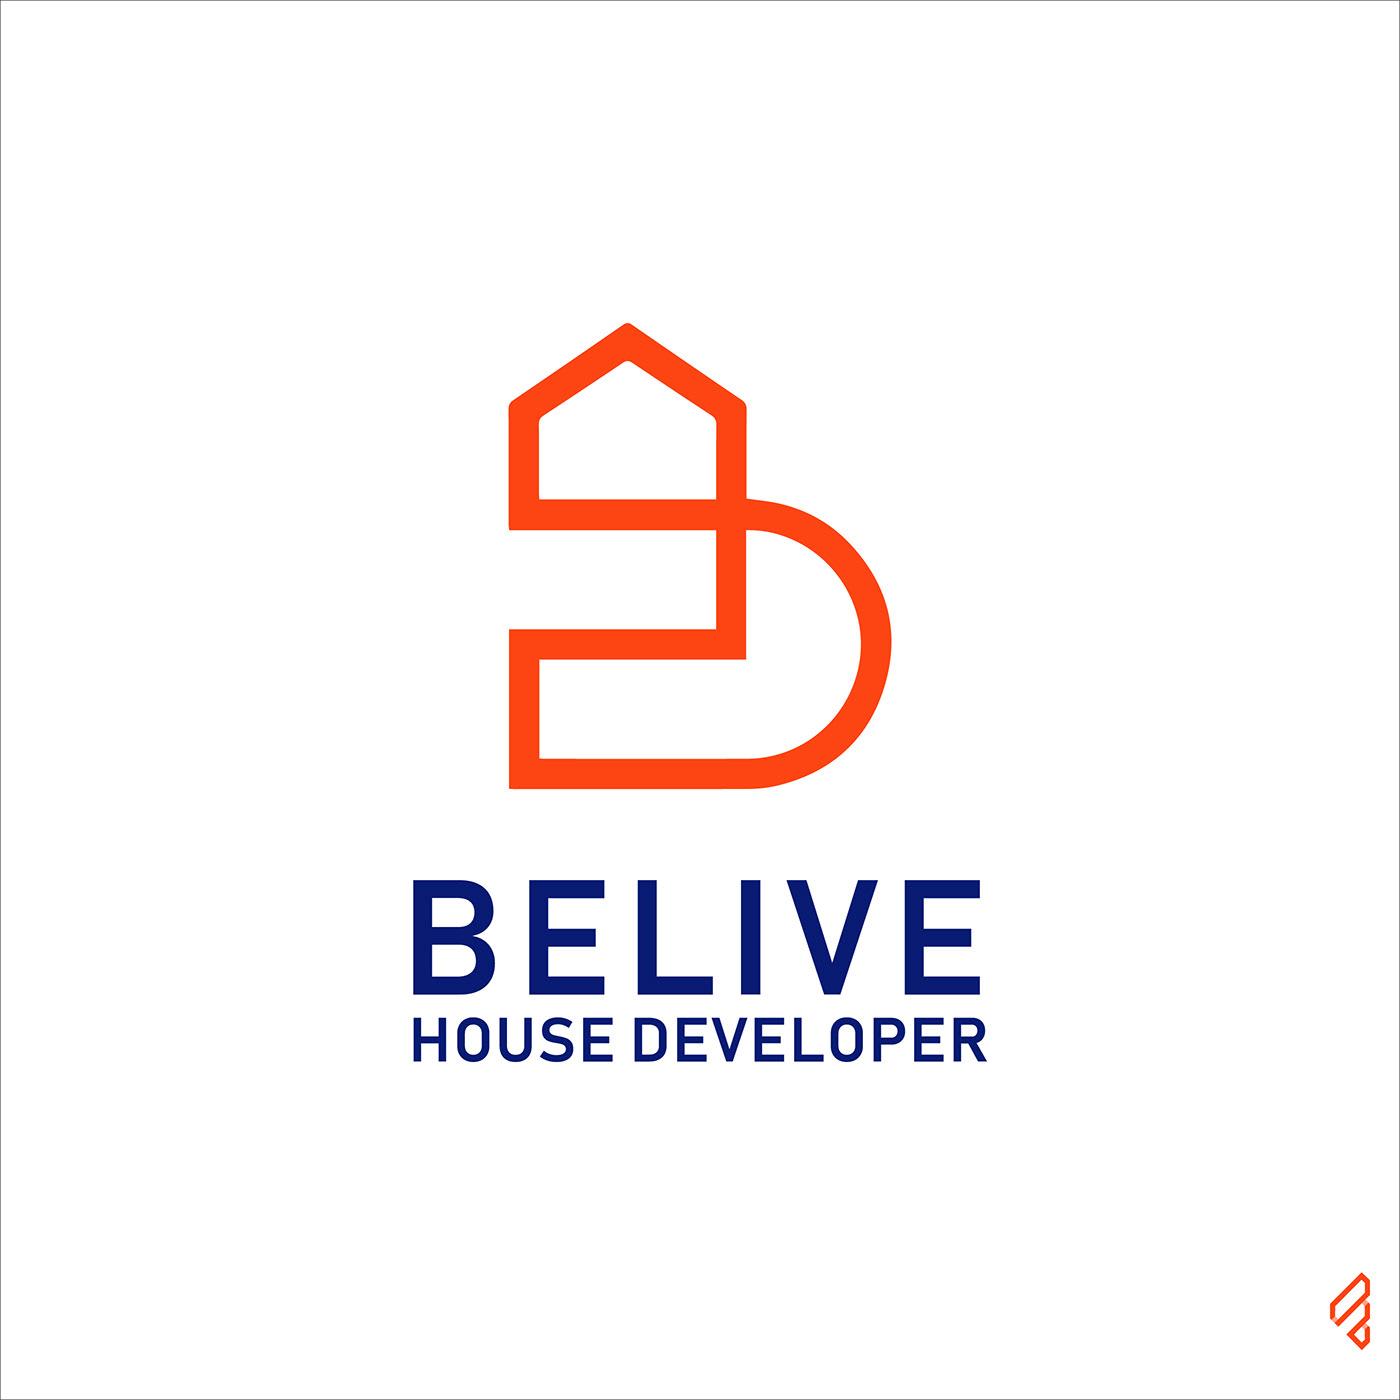 #B #BeliveHouseDeveloper #BLogo #companylogo #CorporateLogo #creativelogo #famebromedia #home #illustrator